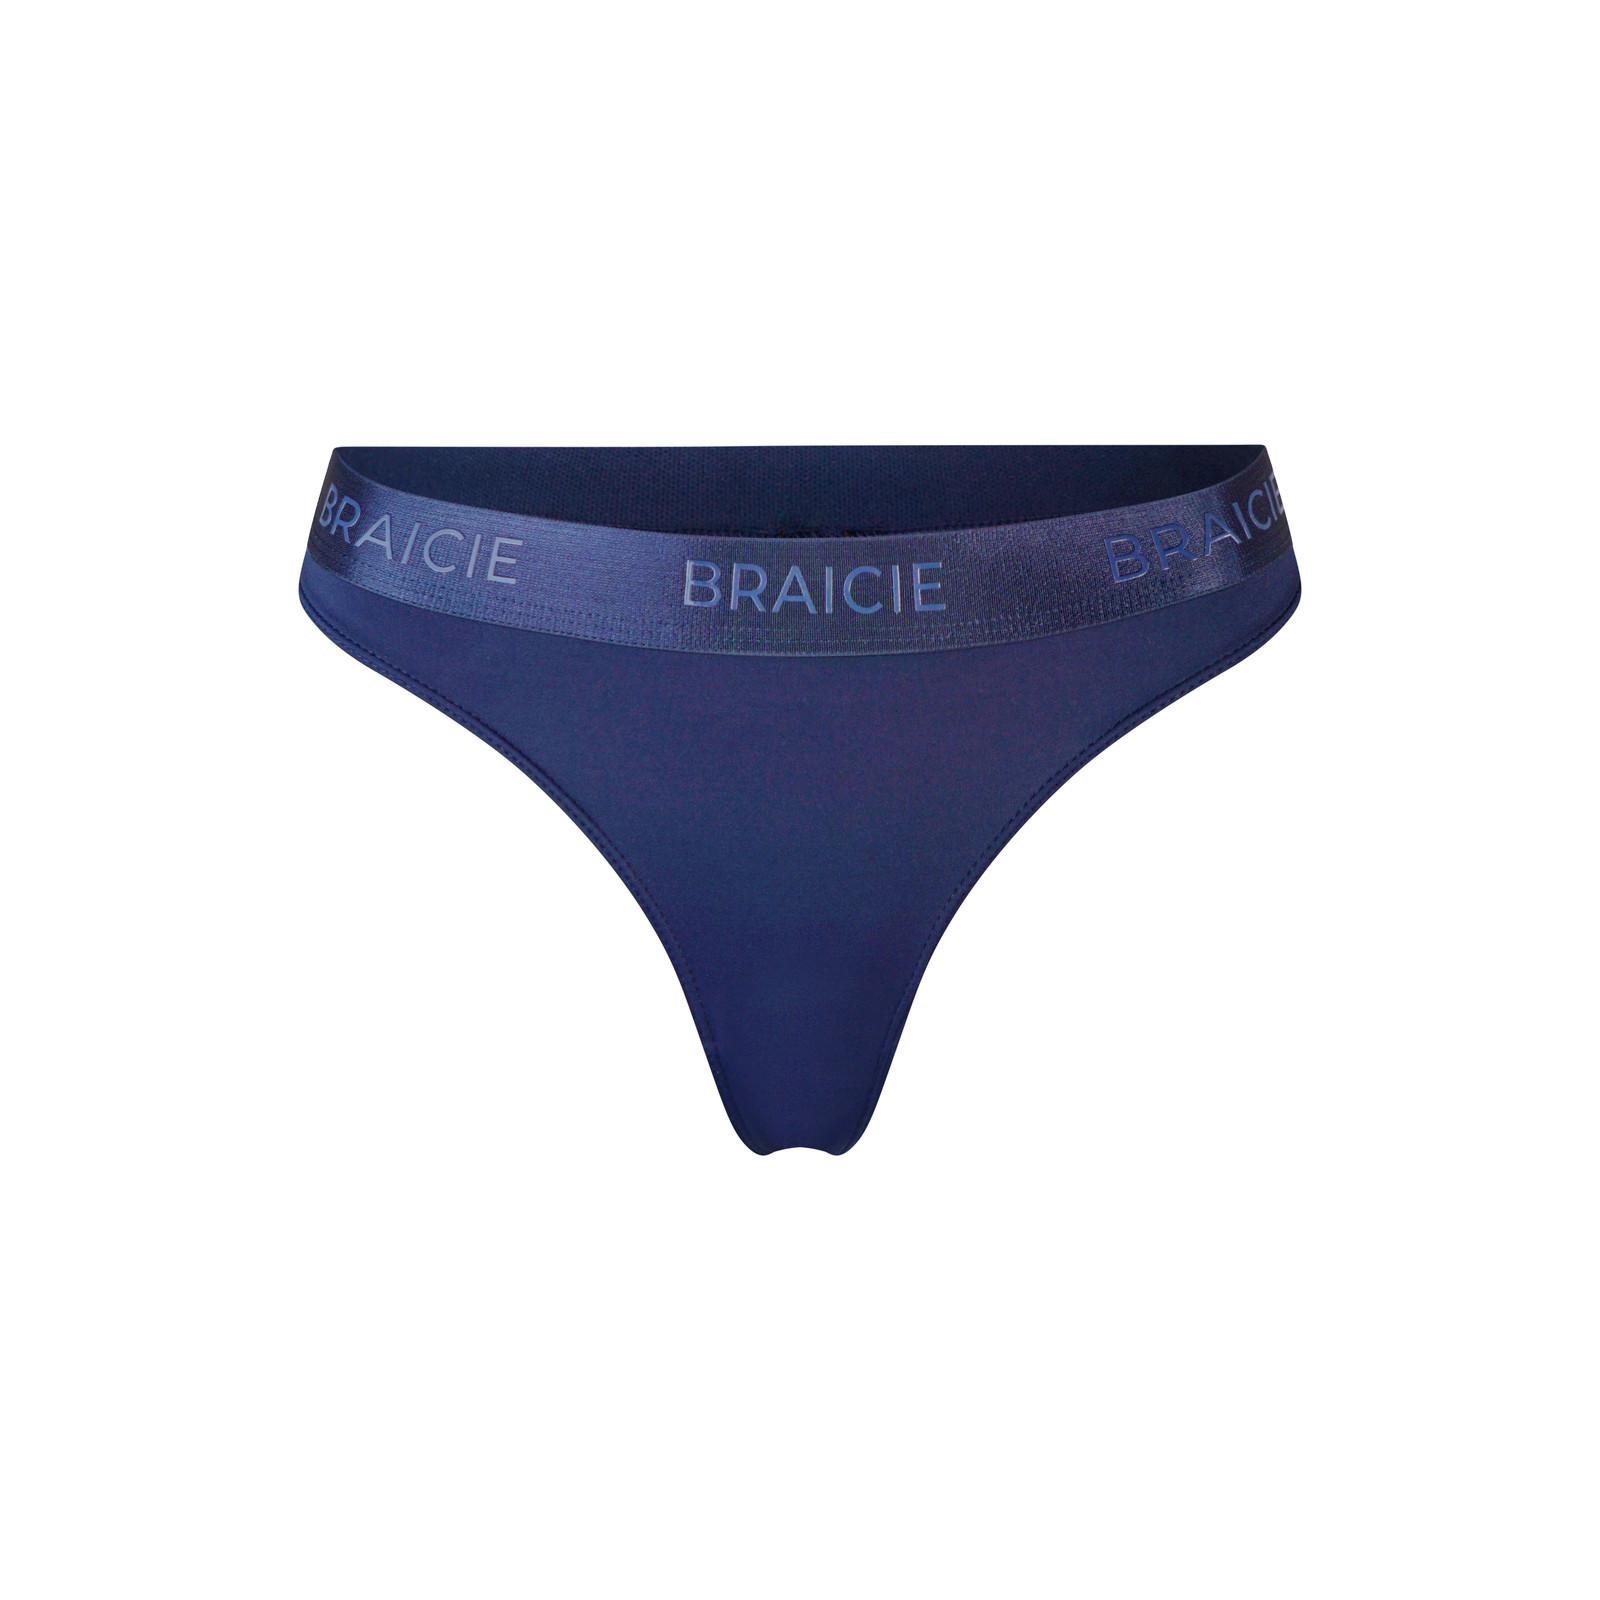 Braicie LIGHT CUT SPORT-STRING IN DEEP BLUE